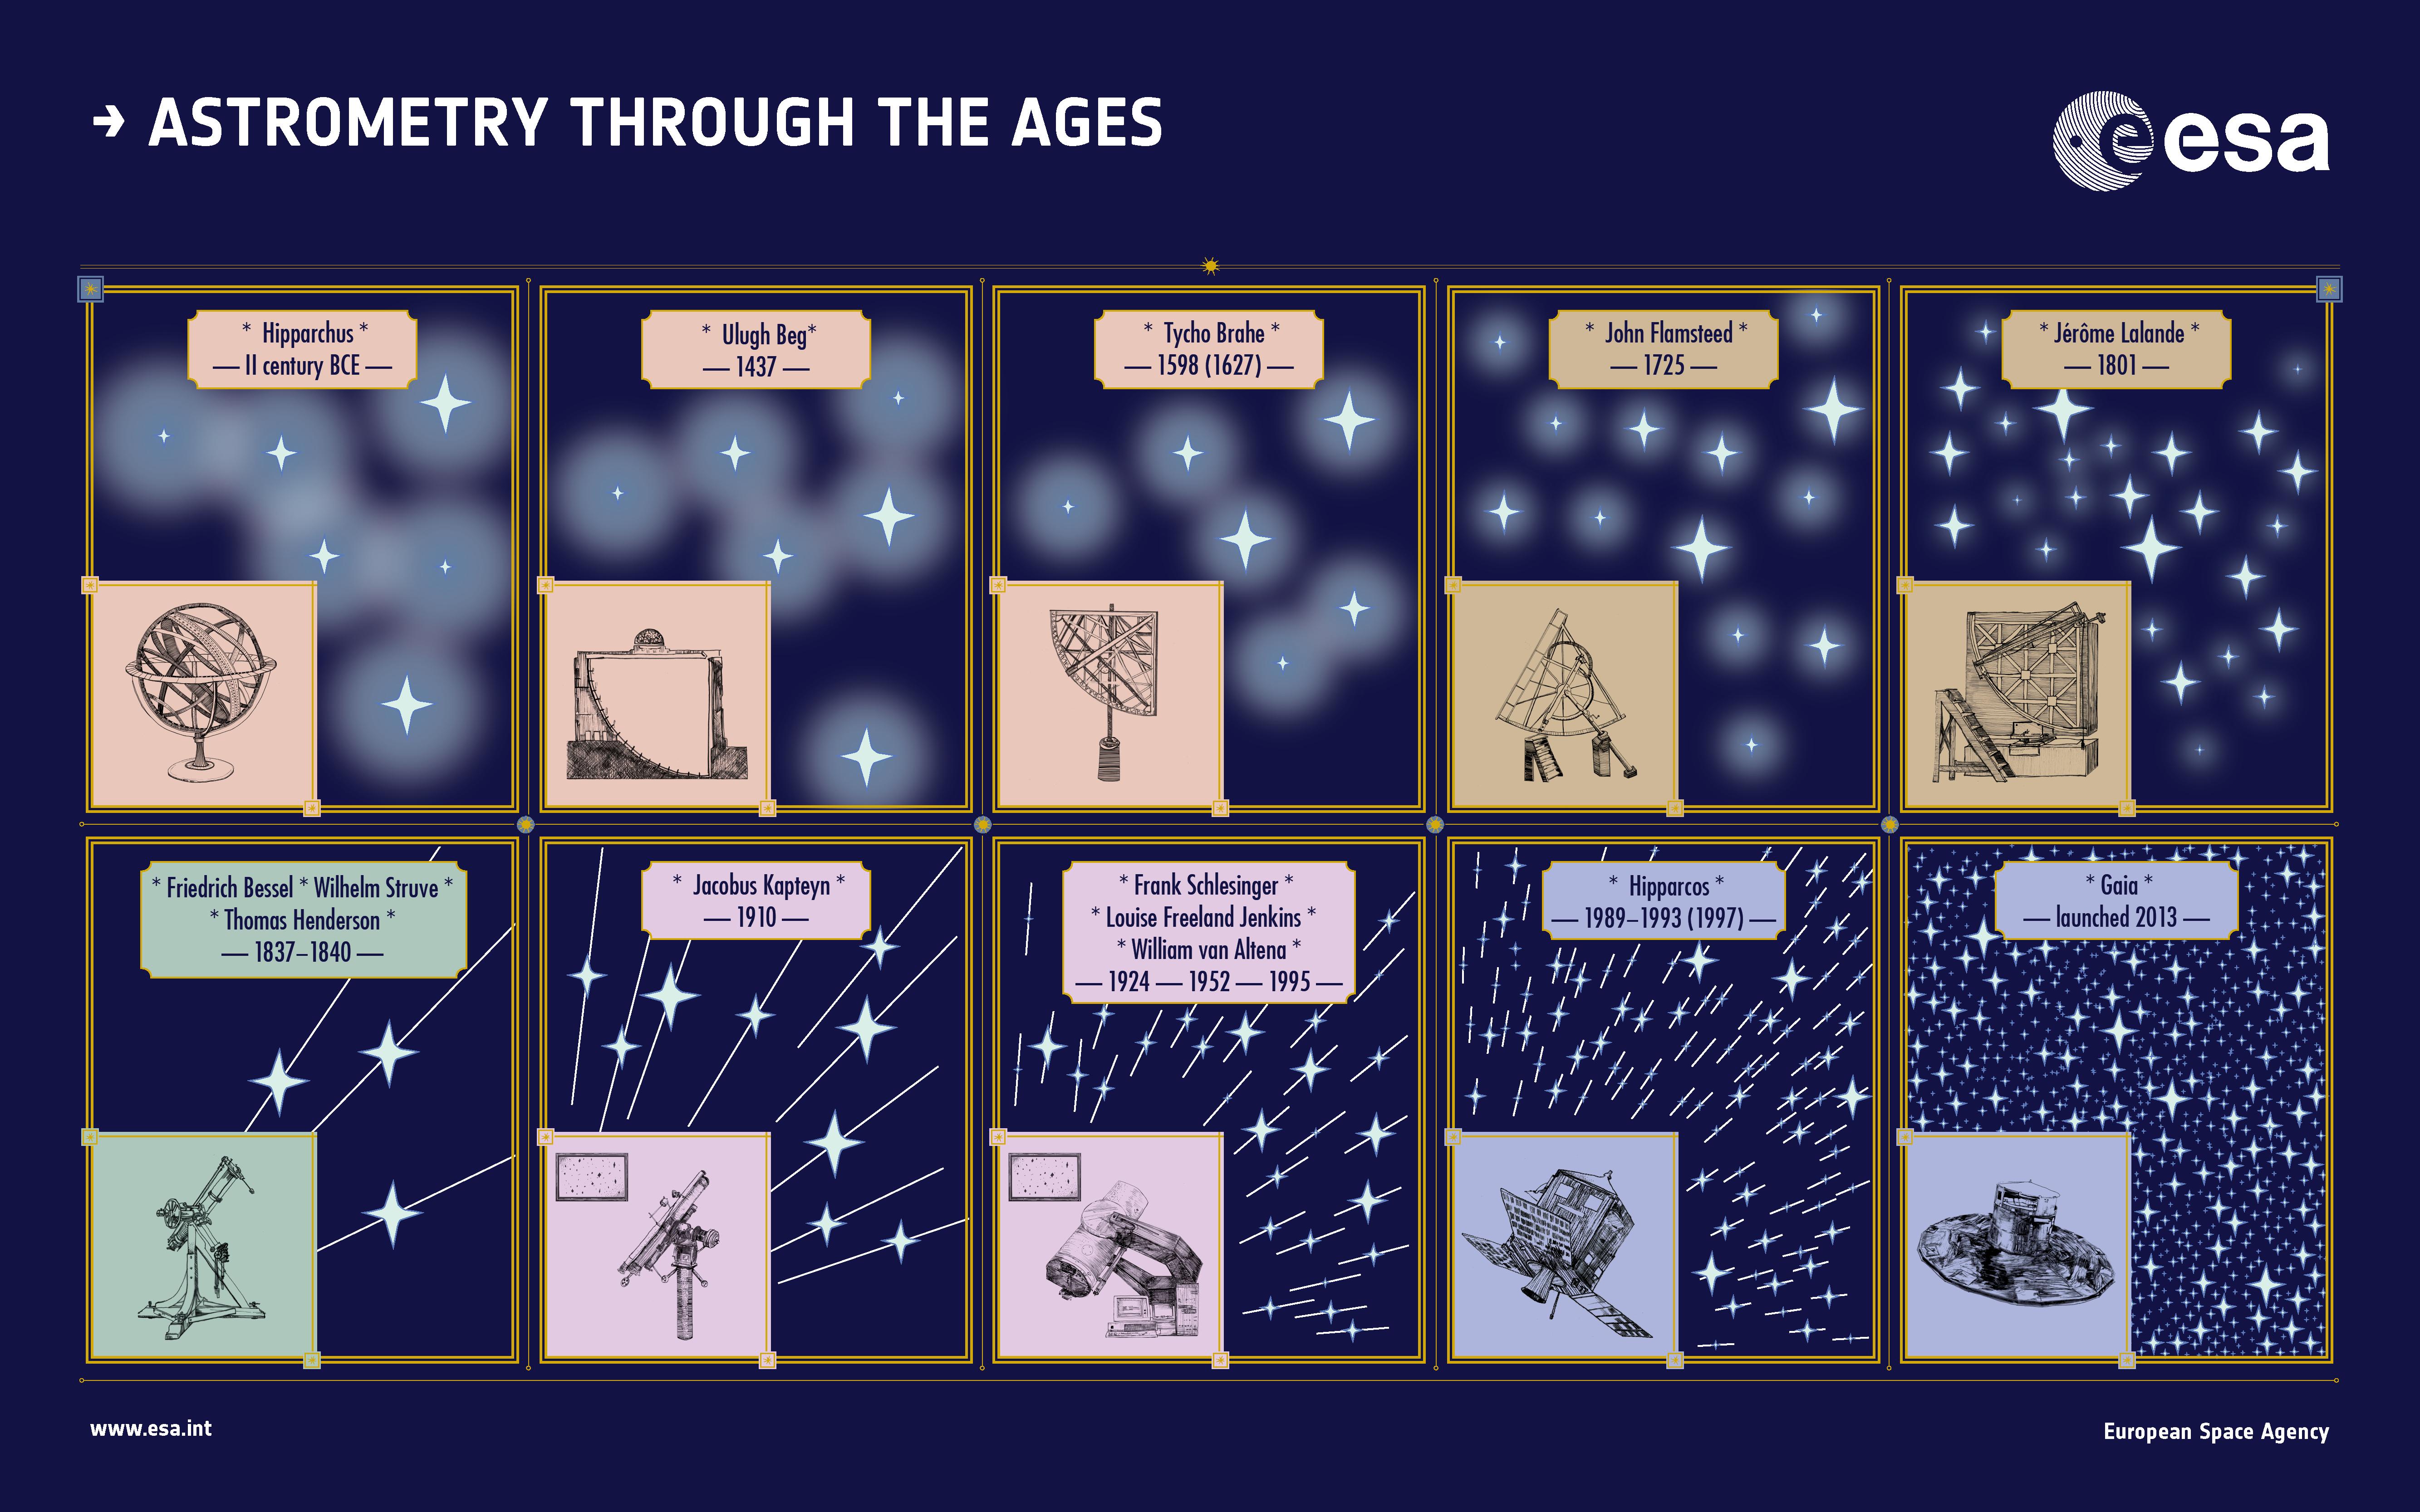 1567215418940-Gaia_Astrometry_through_the_ages.jpg